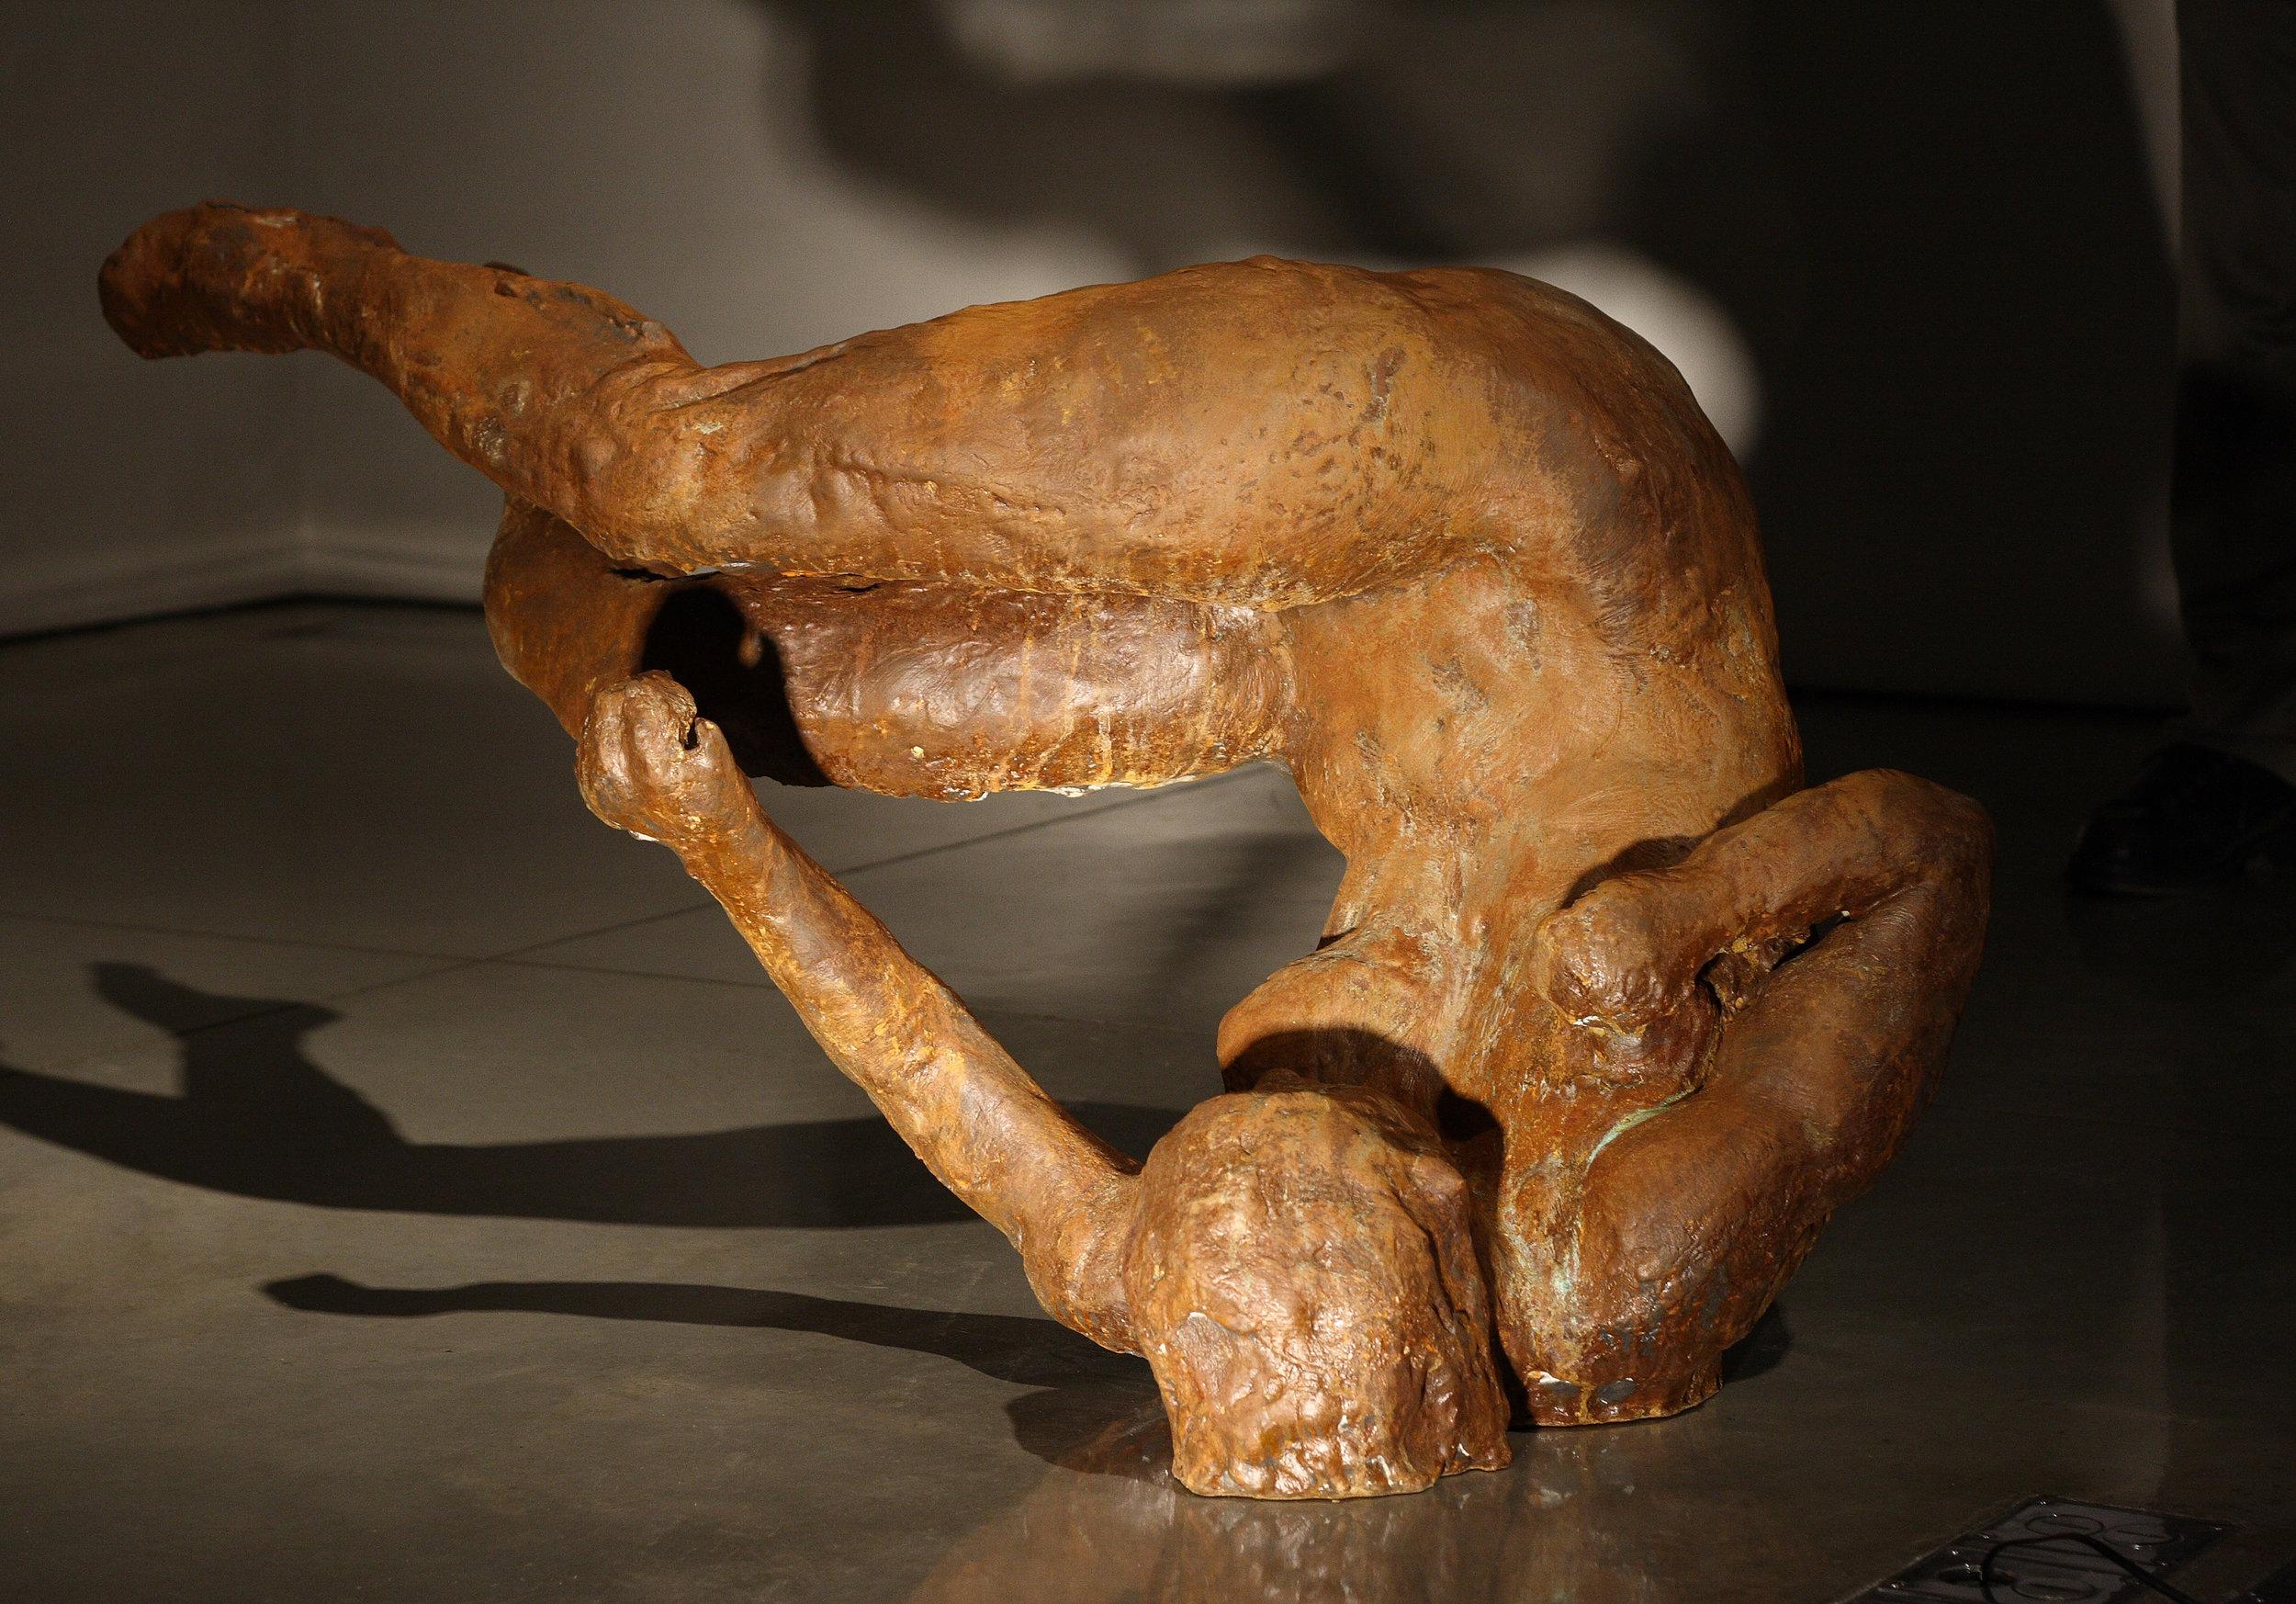 Ten Breaths: Tumbling Woman II, 2007. Bronze 25 1/2 x 47 1/2 x 26 in.